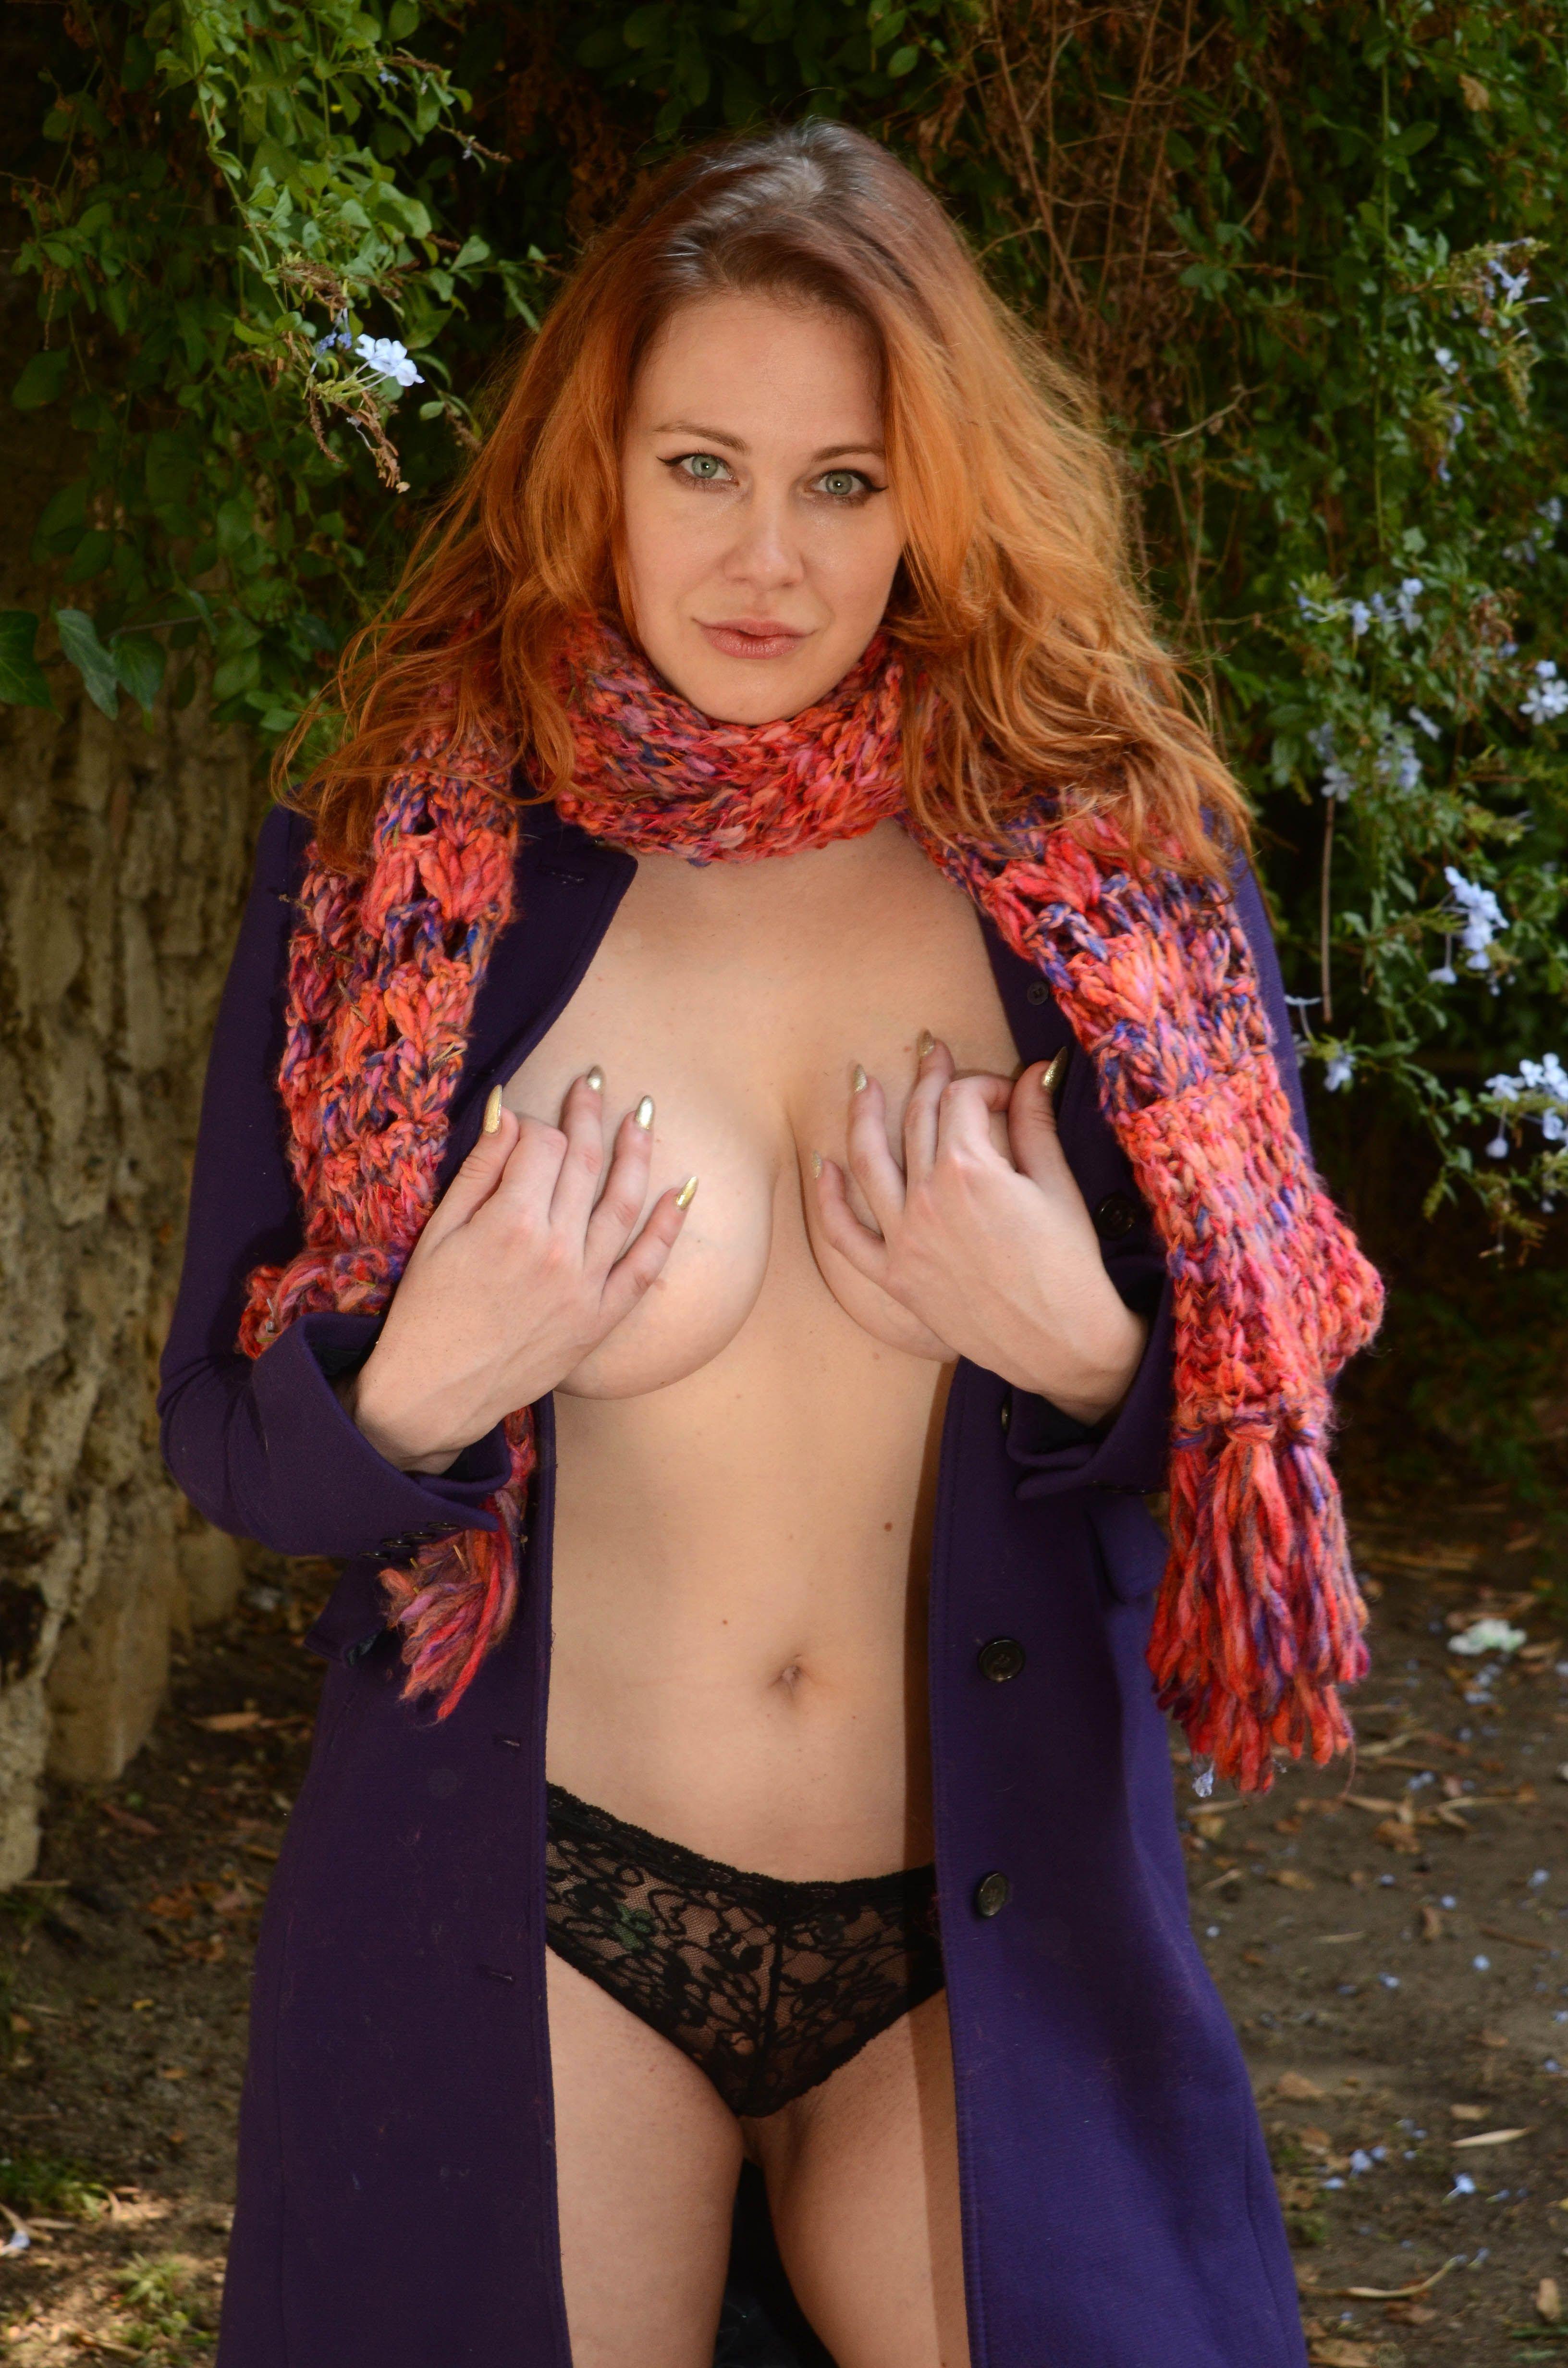 Maitland Ward nude pic